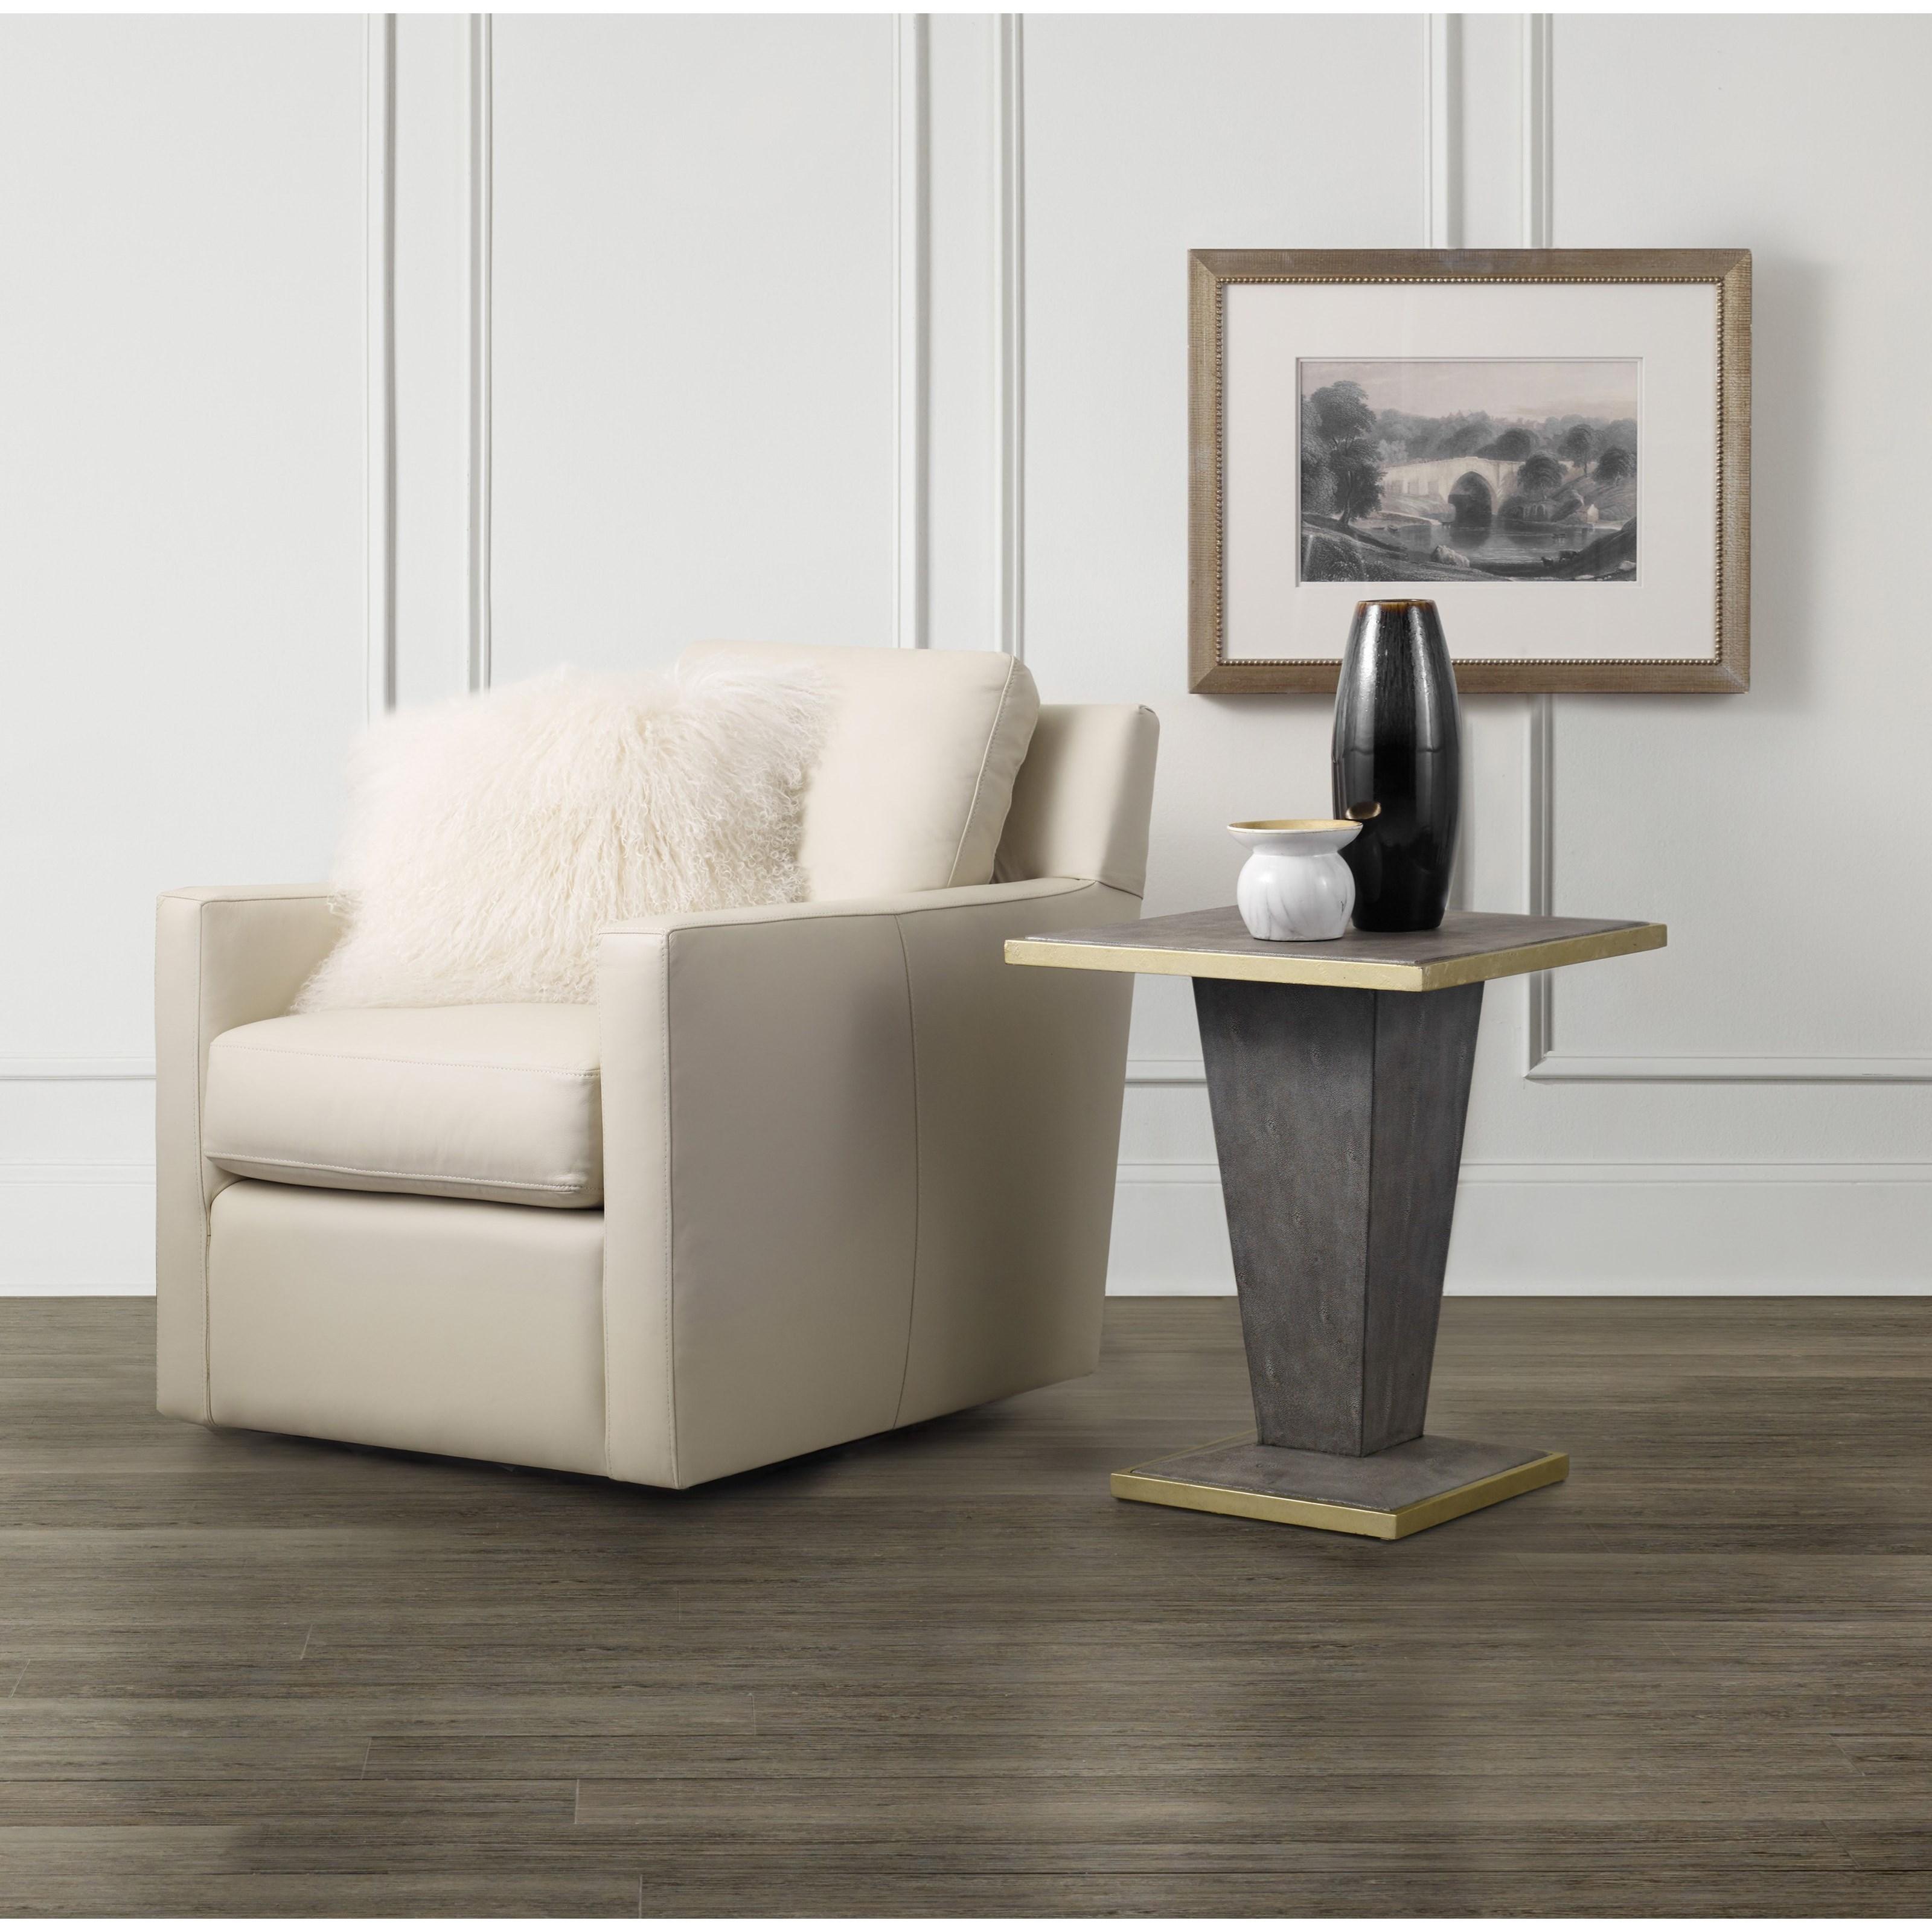 Hooker Furniture Living Room Accents Square Shagreen End Table Belfort Furniture End Tables